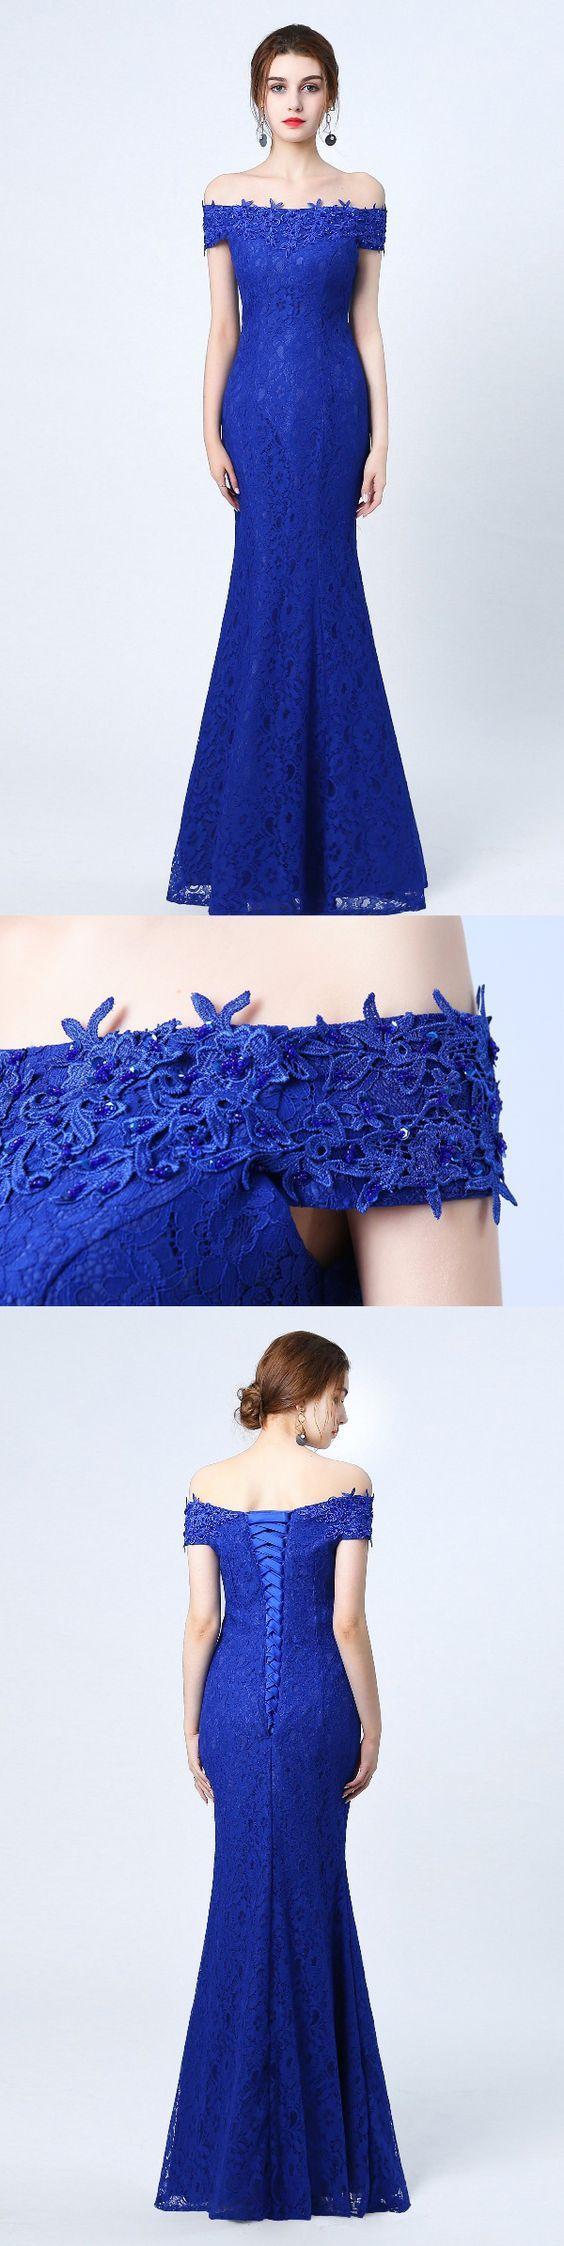 Long prom dresses lace prom dresses mermaid party dress